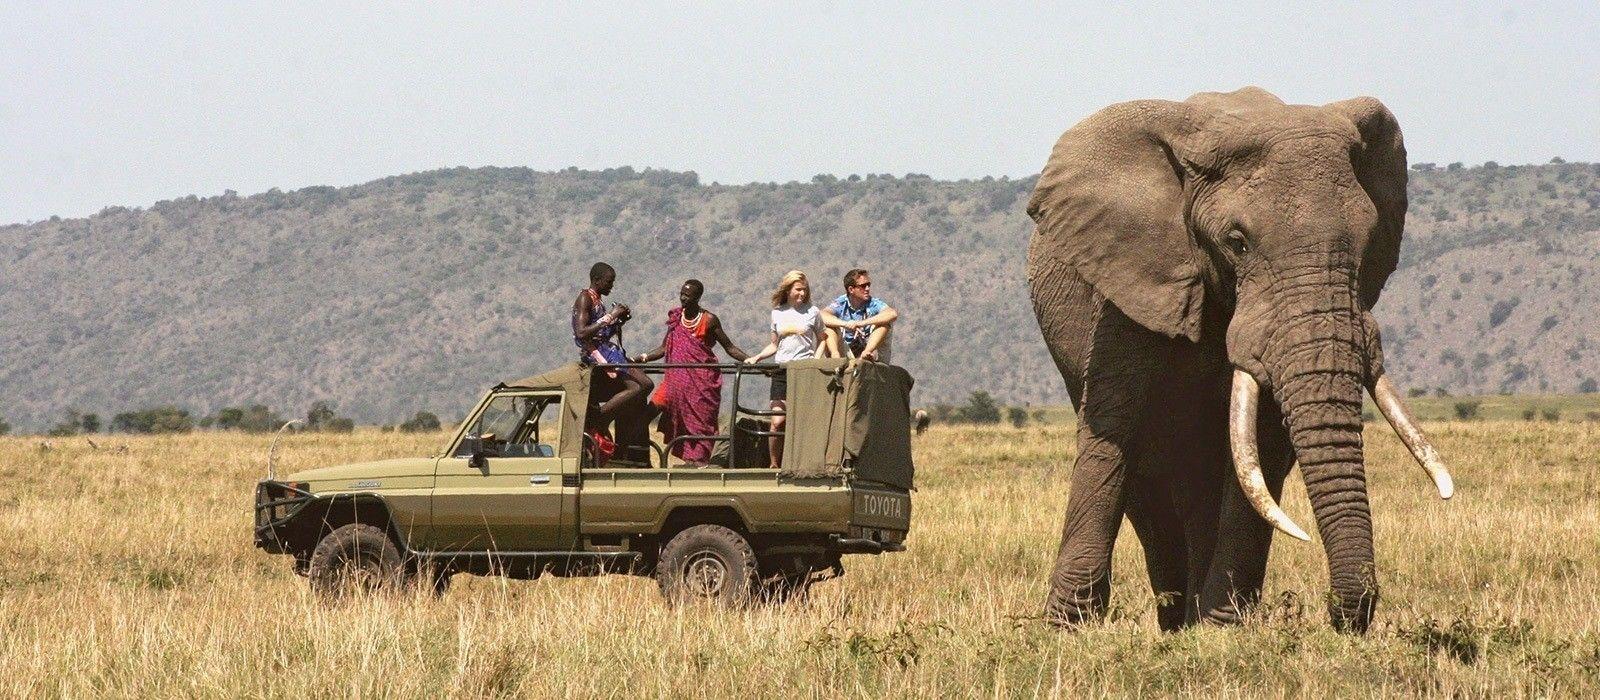 Safari Highlights of Kenya Tour Trip 3